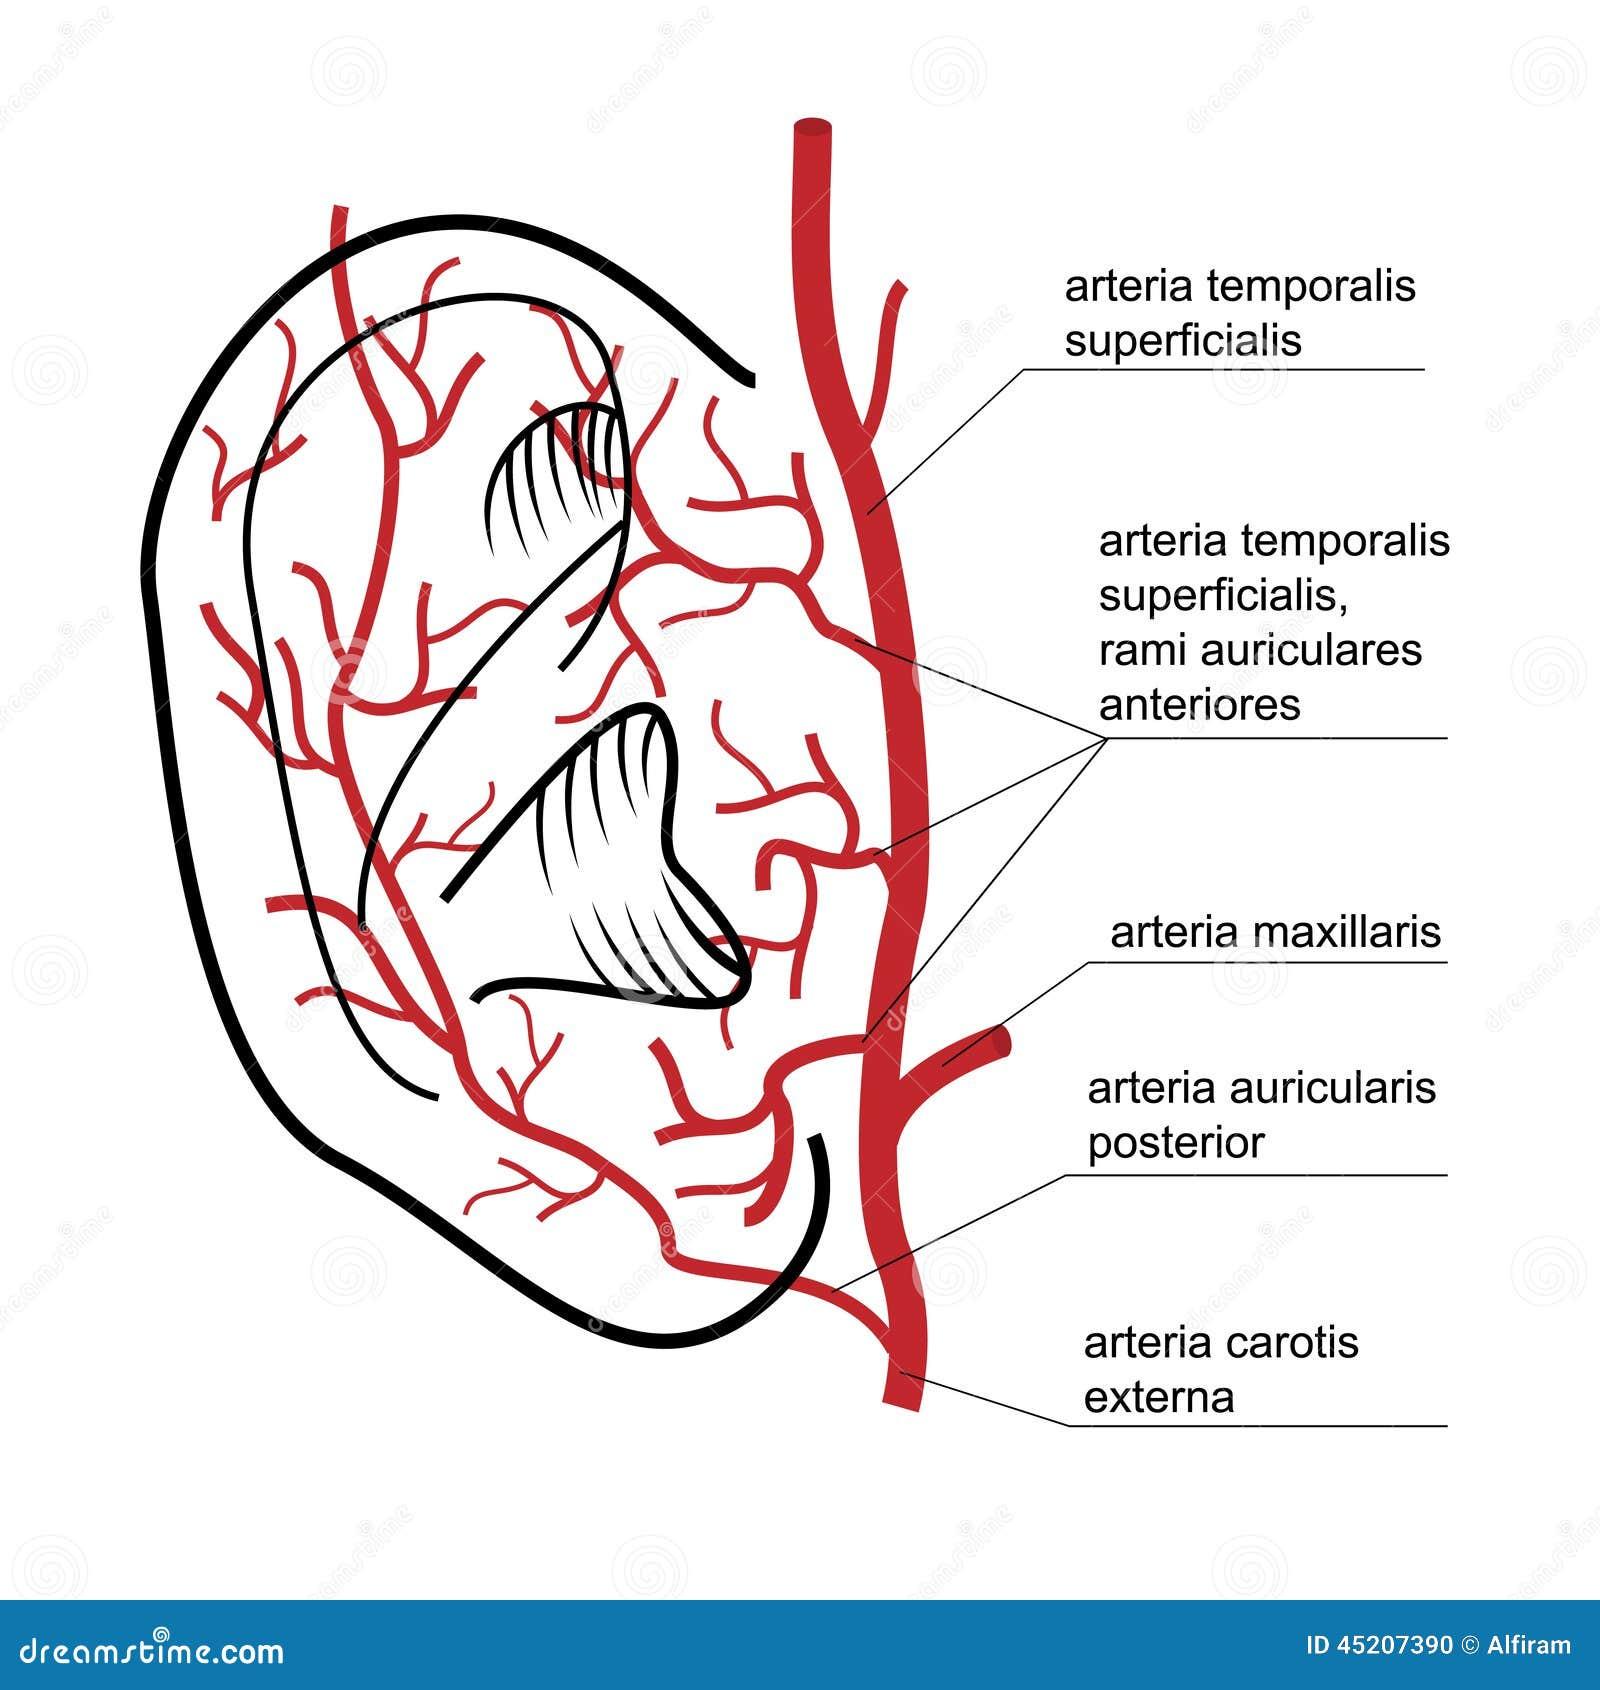 Outer Ear Anatomy Pinna. Know your Ear - MTM